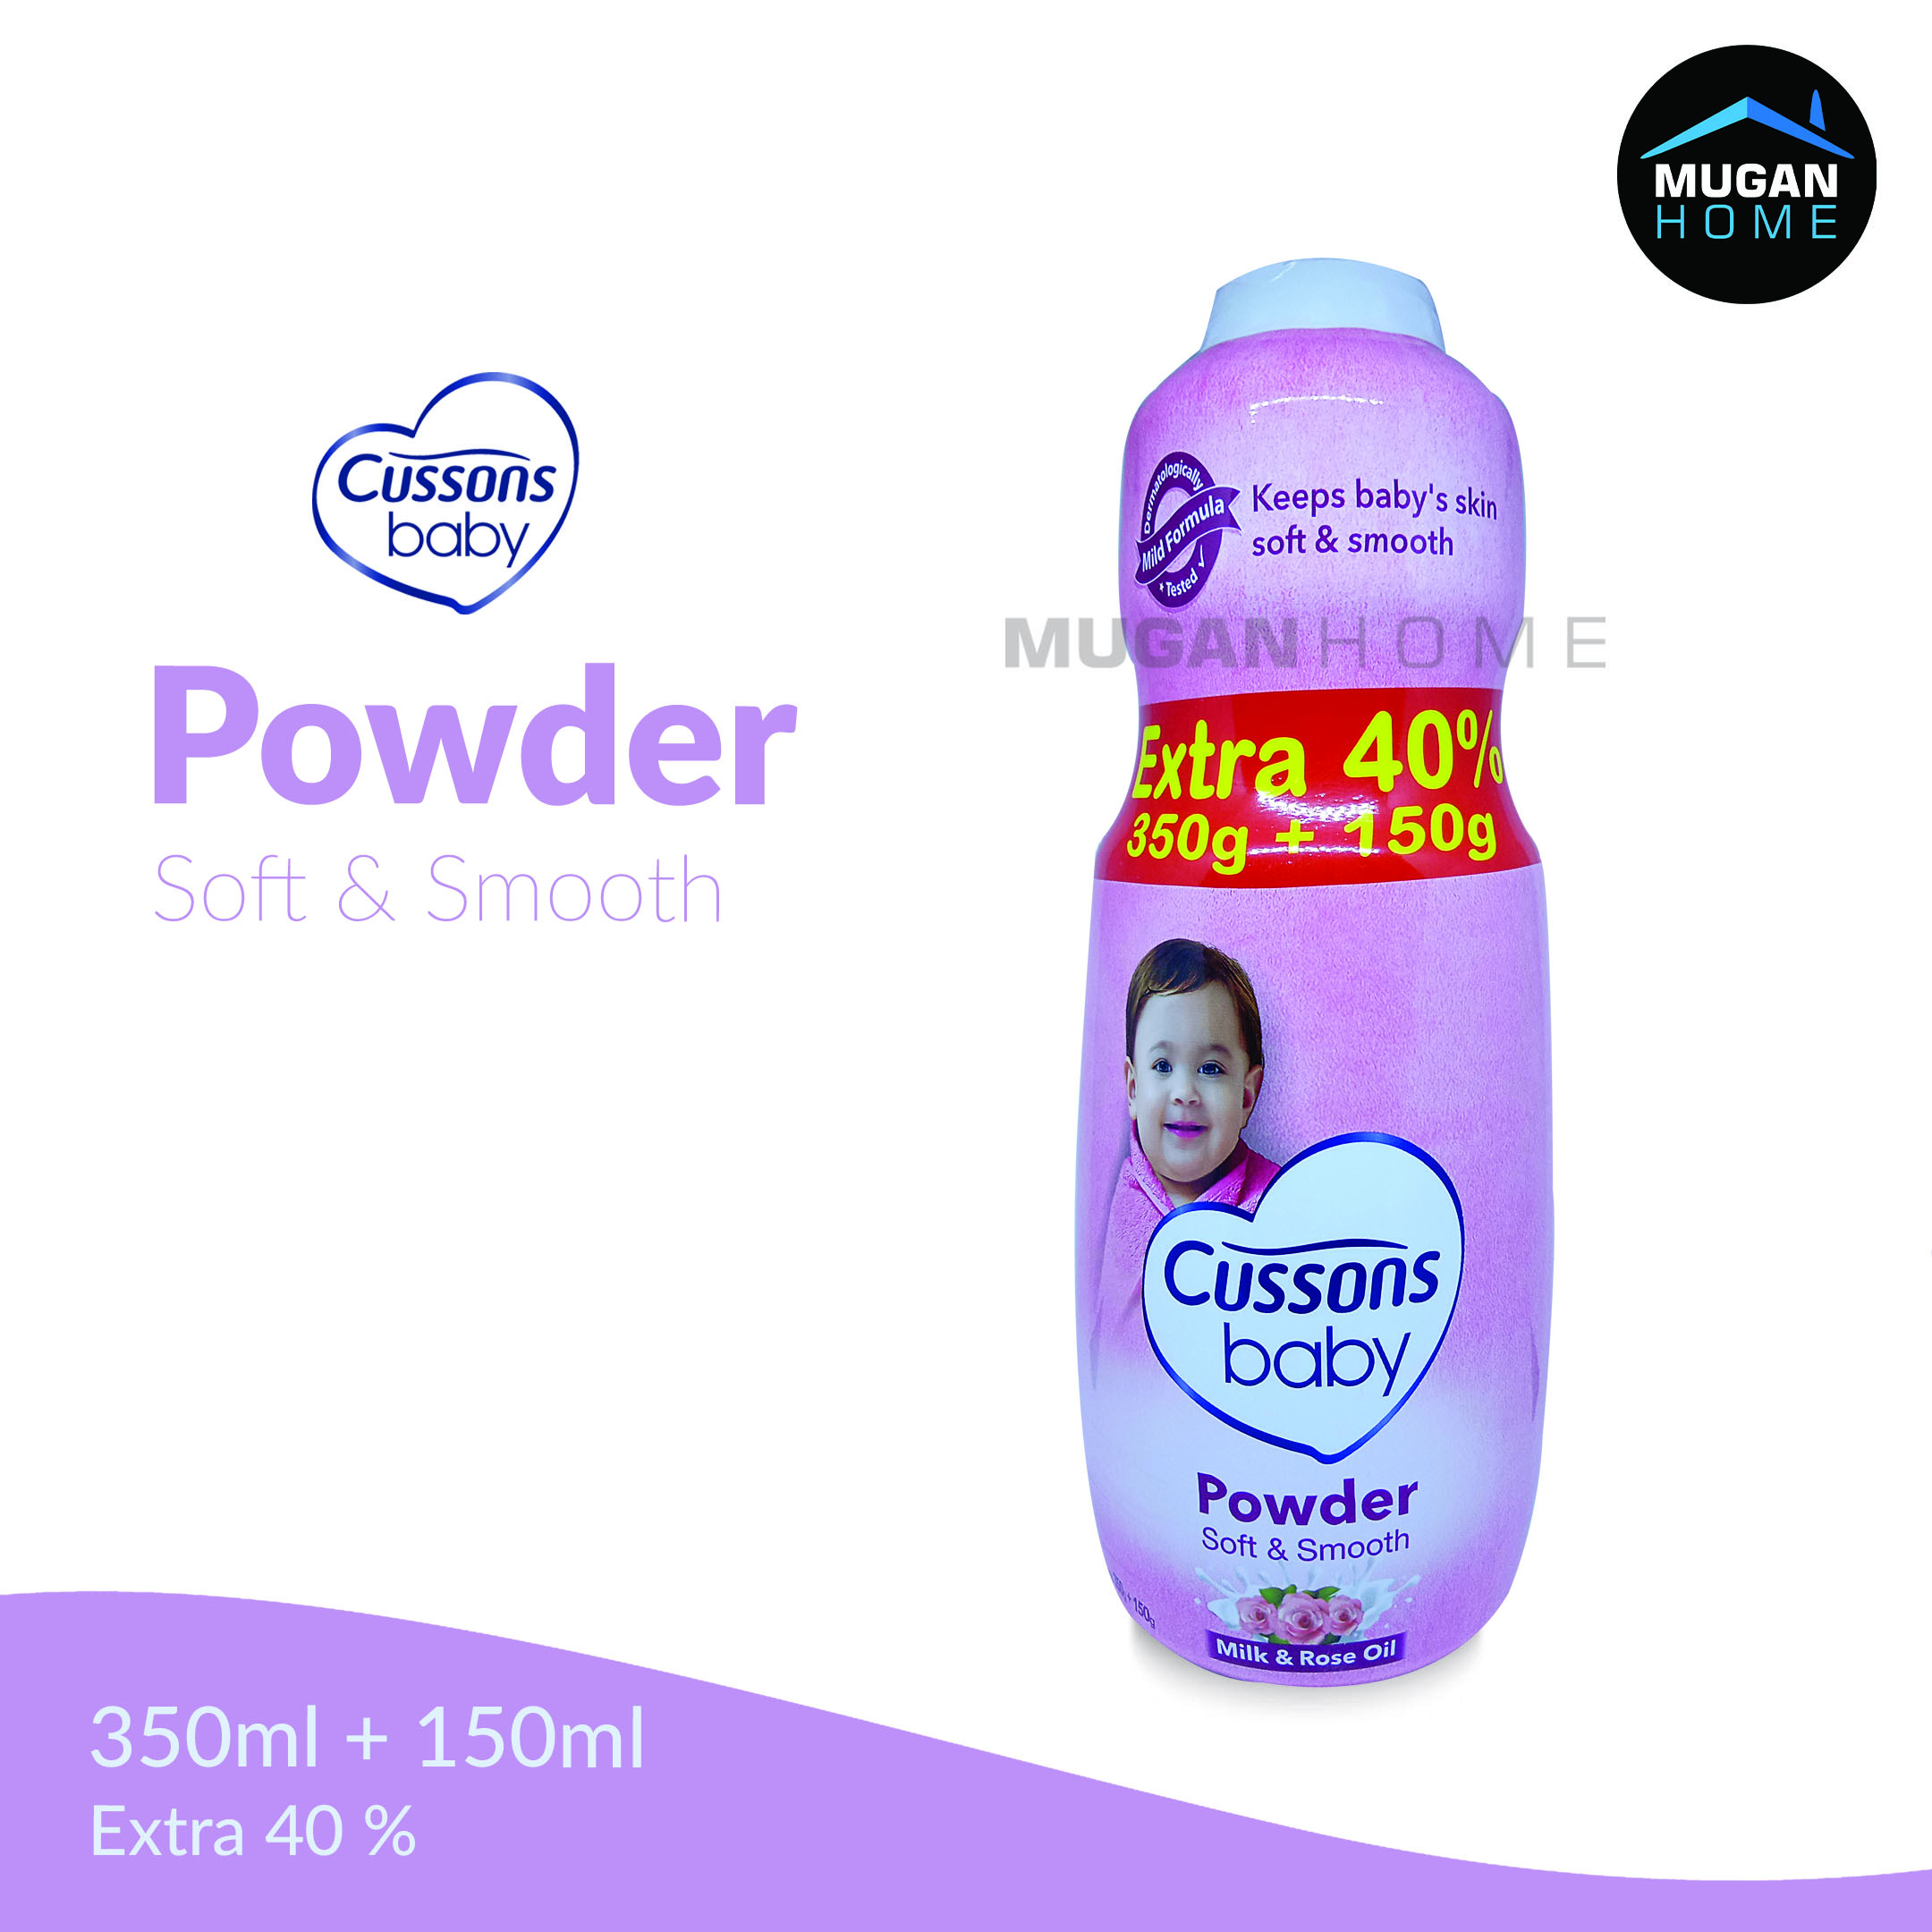 CUSSONS BABY POWDER 350GR SOFT & SMOOTH EXTRA 40% 150GR